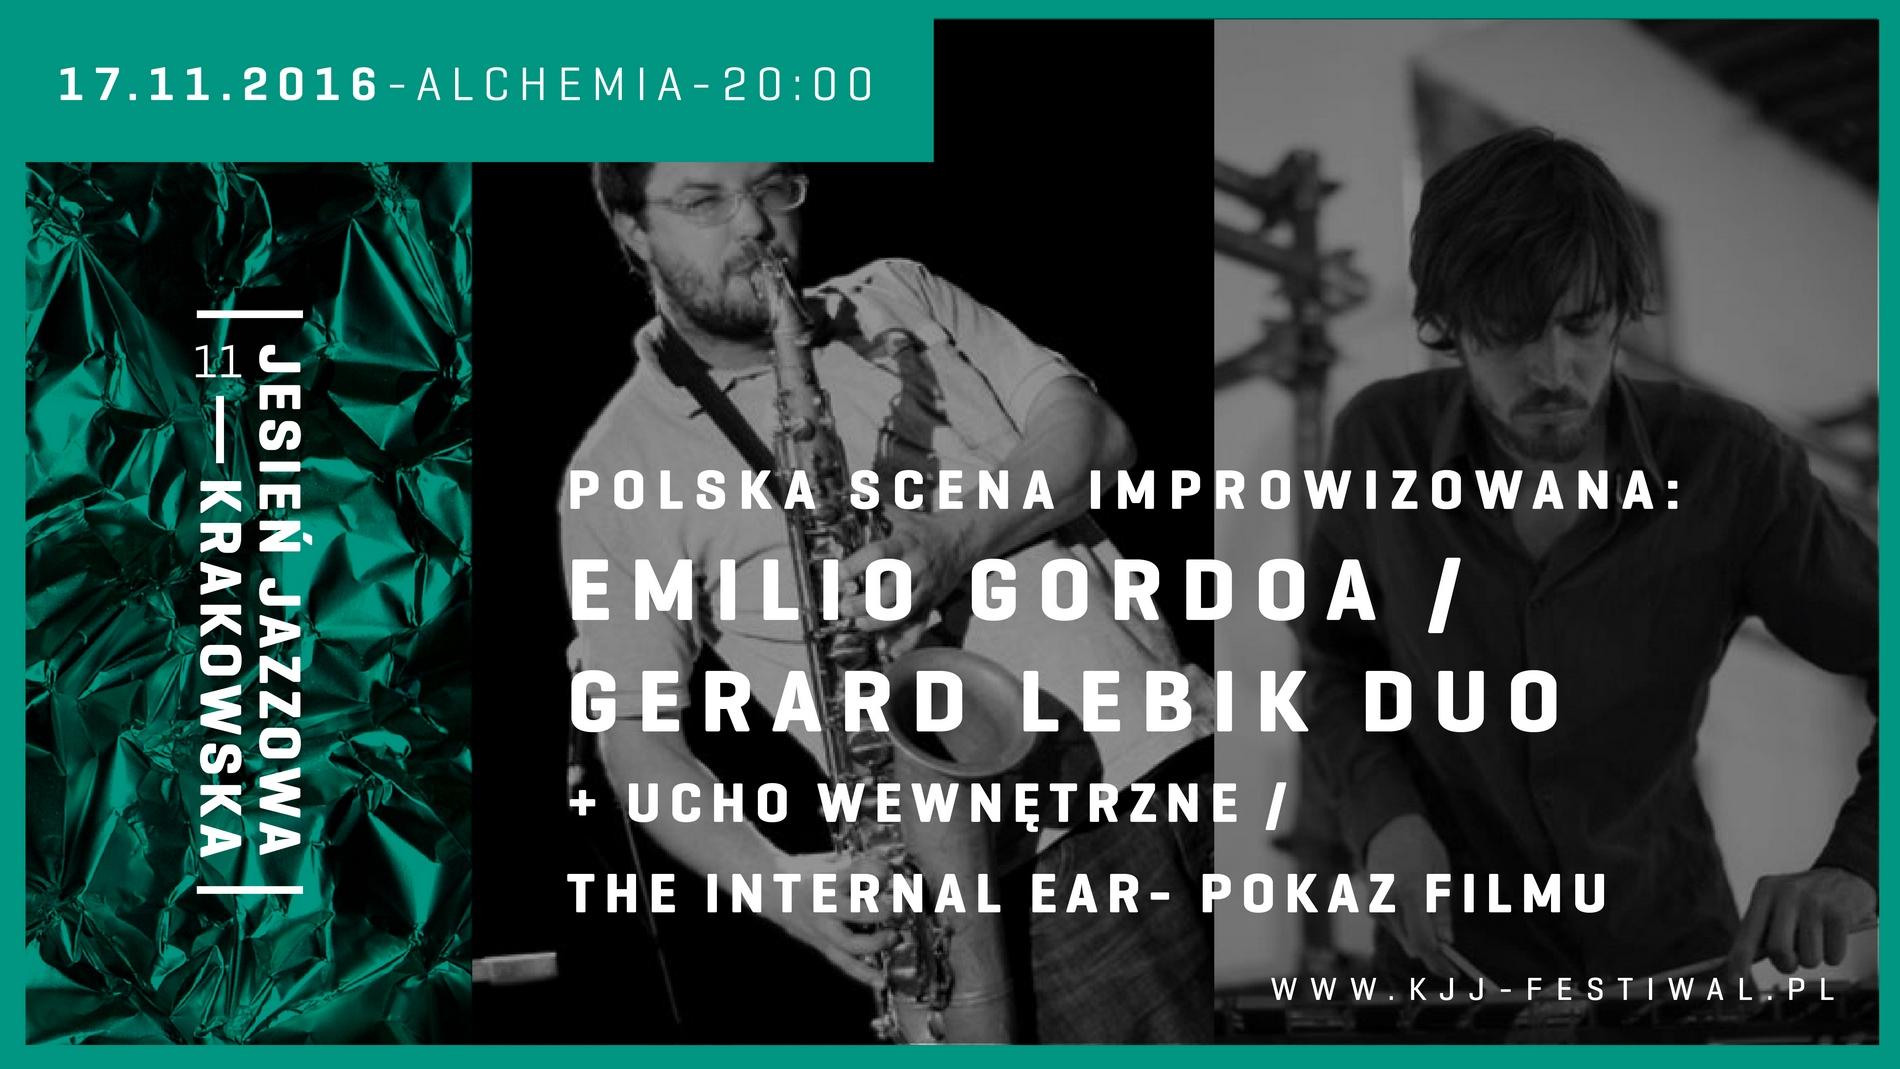 Gerard Lebik / Emilio Gordoa Duo (źródło: materiały prasowe organizatora)